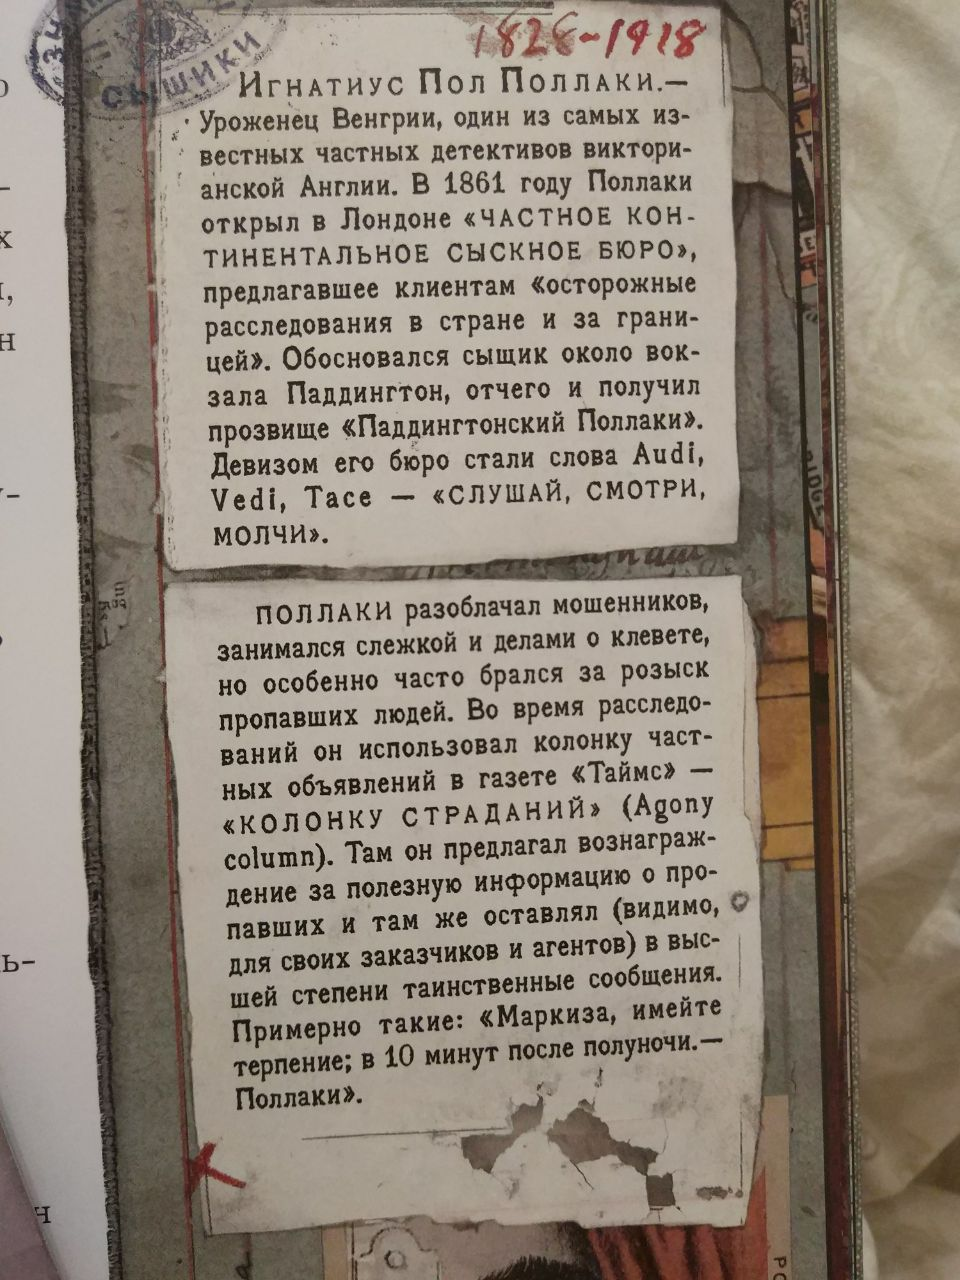 http://s7.uploads.ru/k4qfl.jpg